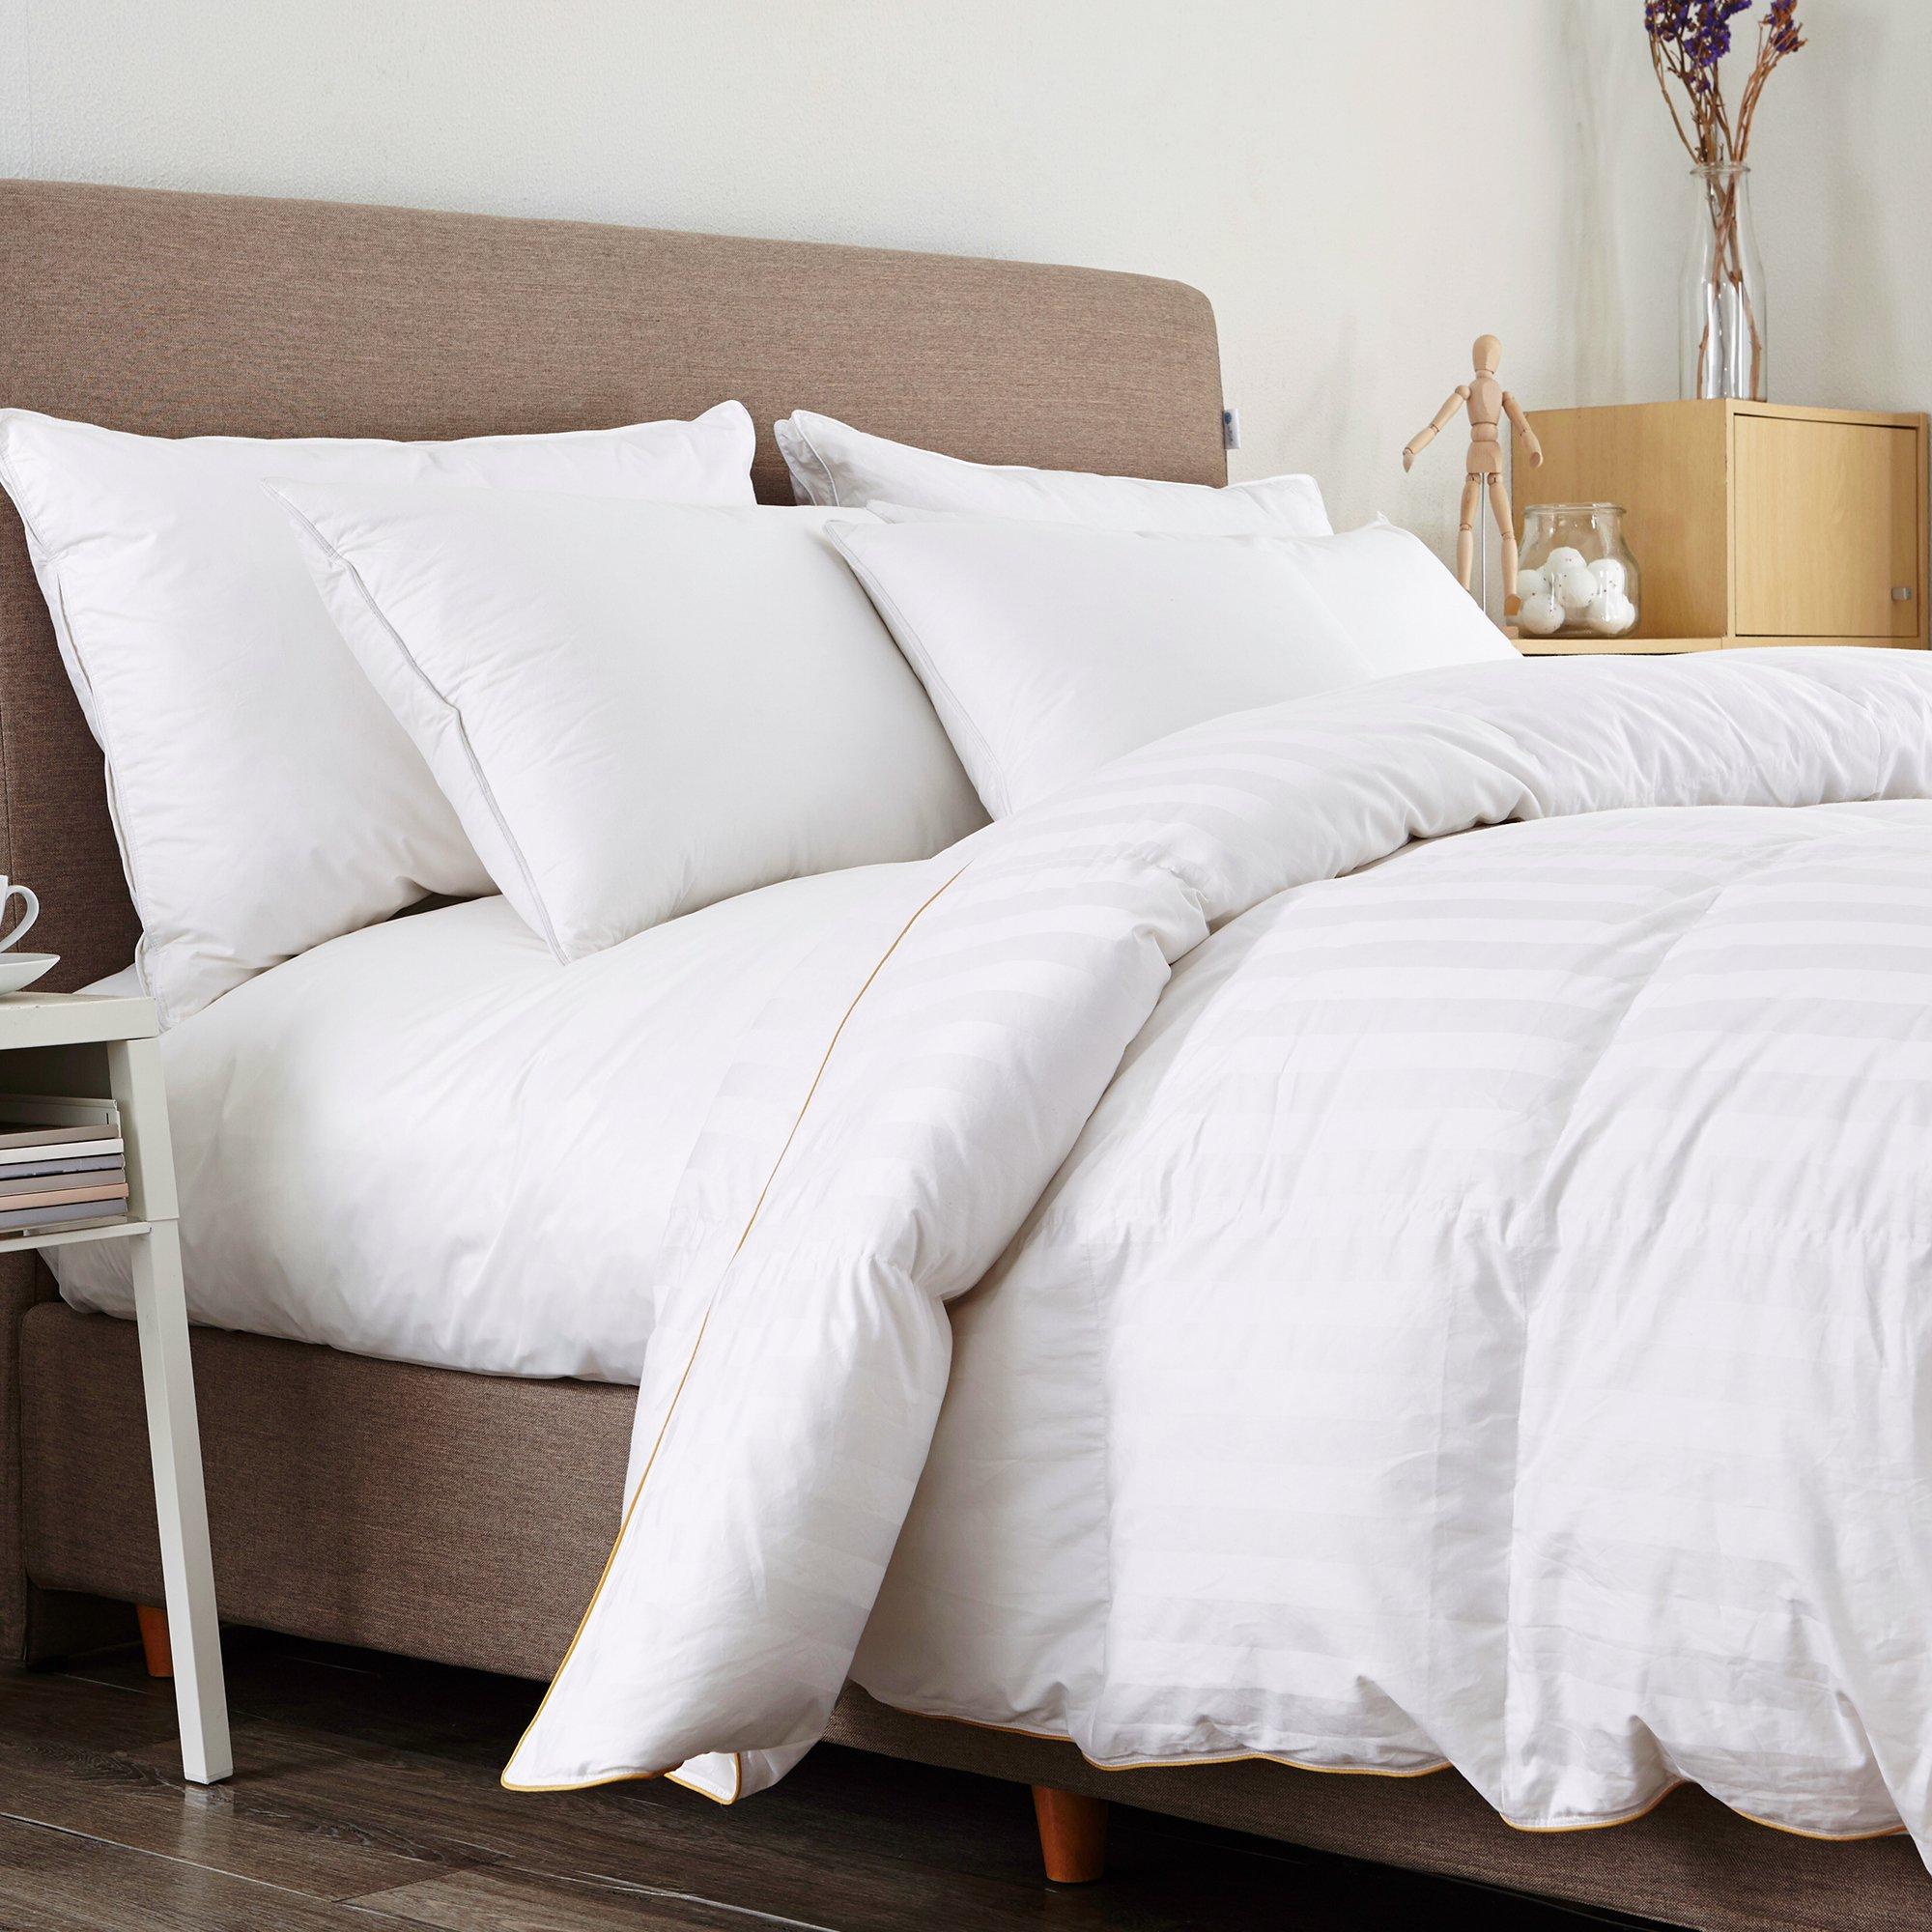 Premium Goose Down Comforter All Seasons 600 FP 500 TC